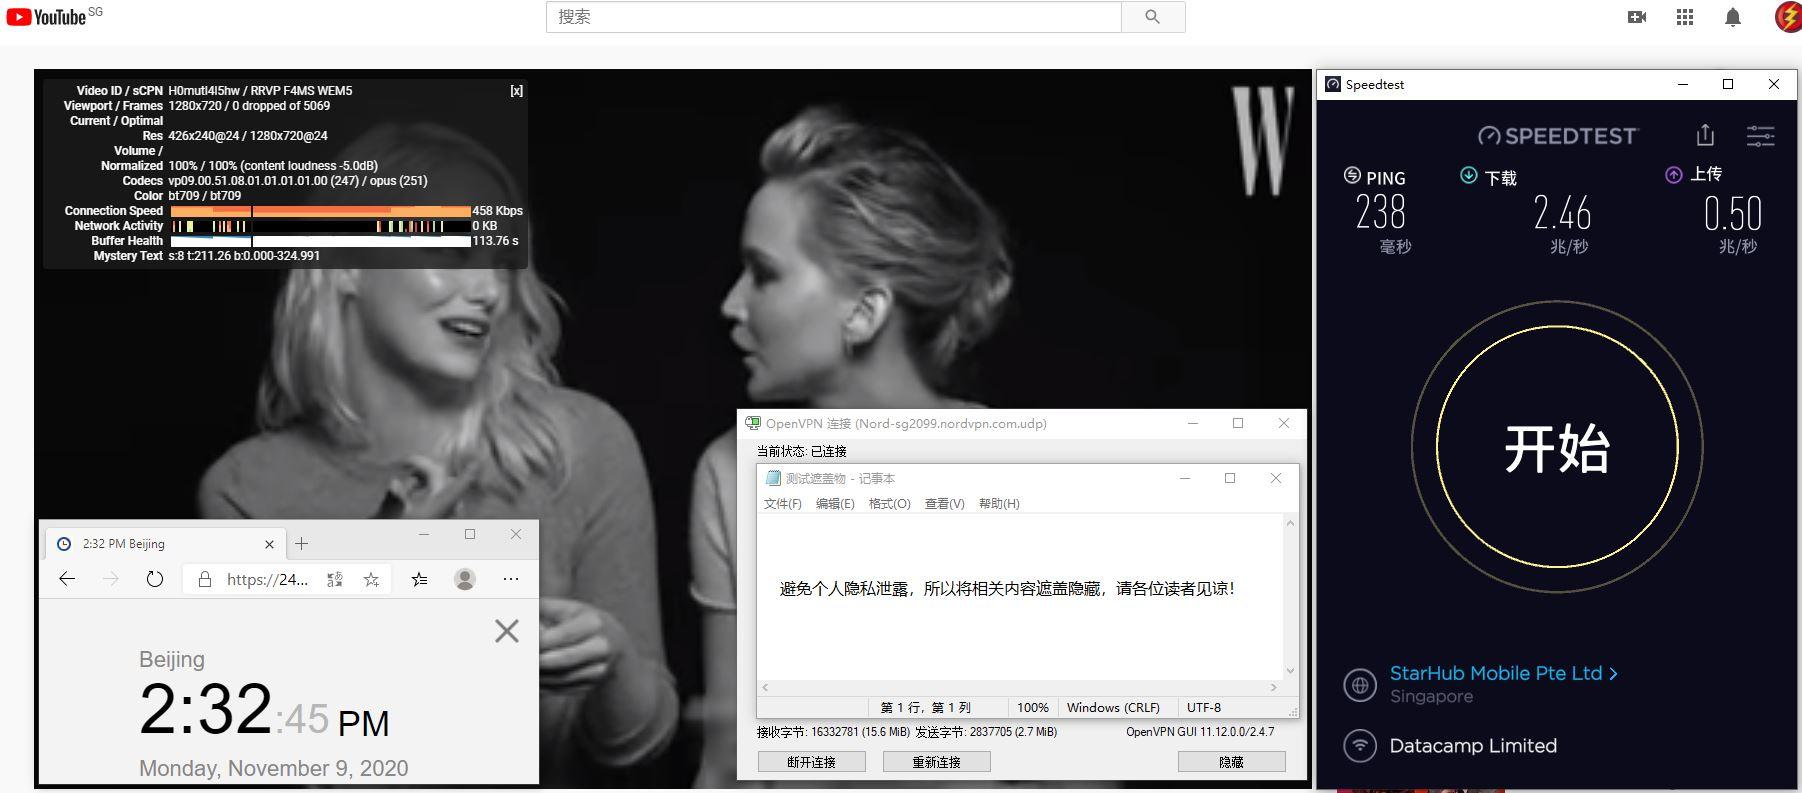 Windows10 NordVPN OpenVPN Gui Sg2099 服务器 中国VPN 翻墙 科学上网 测试 - 20201109